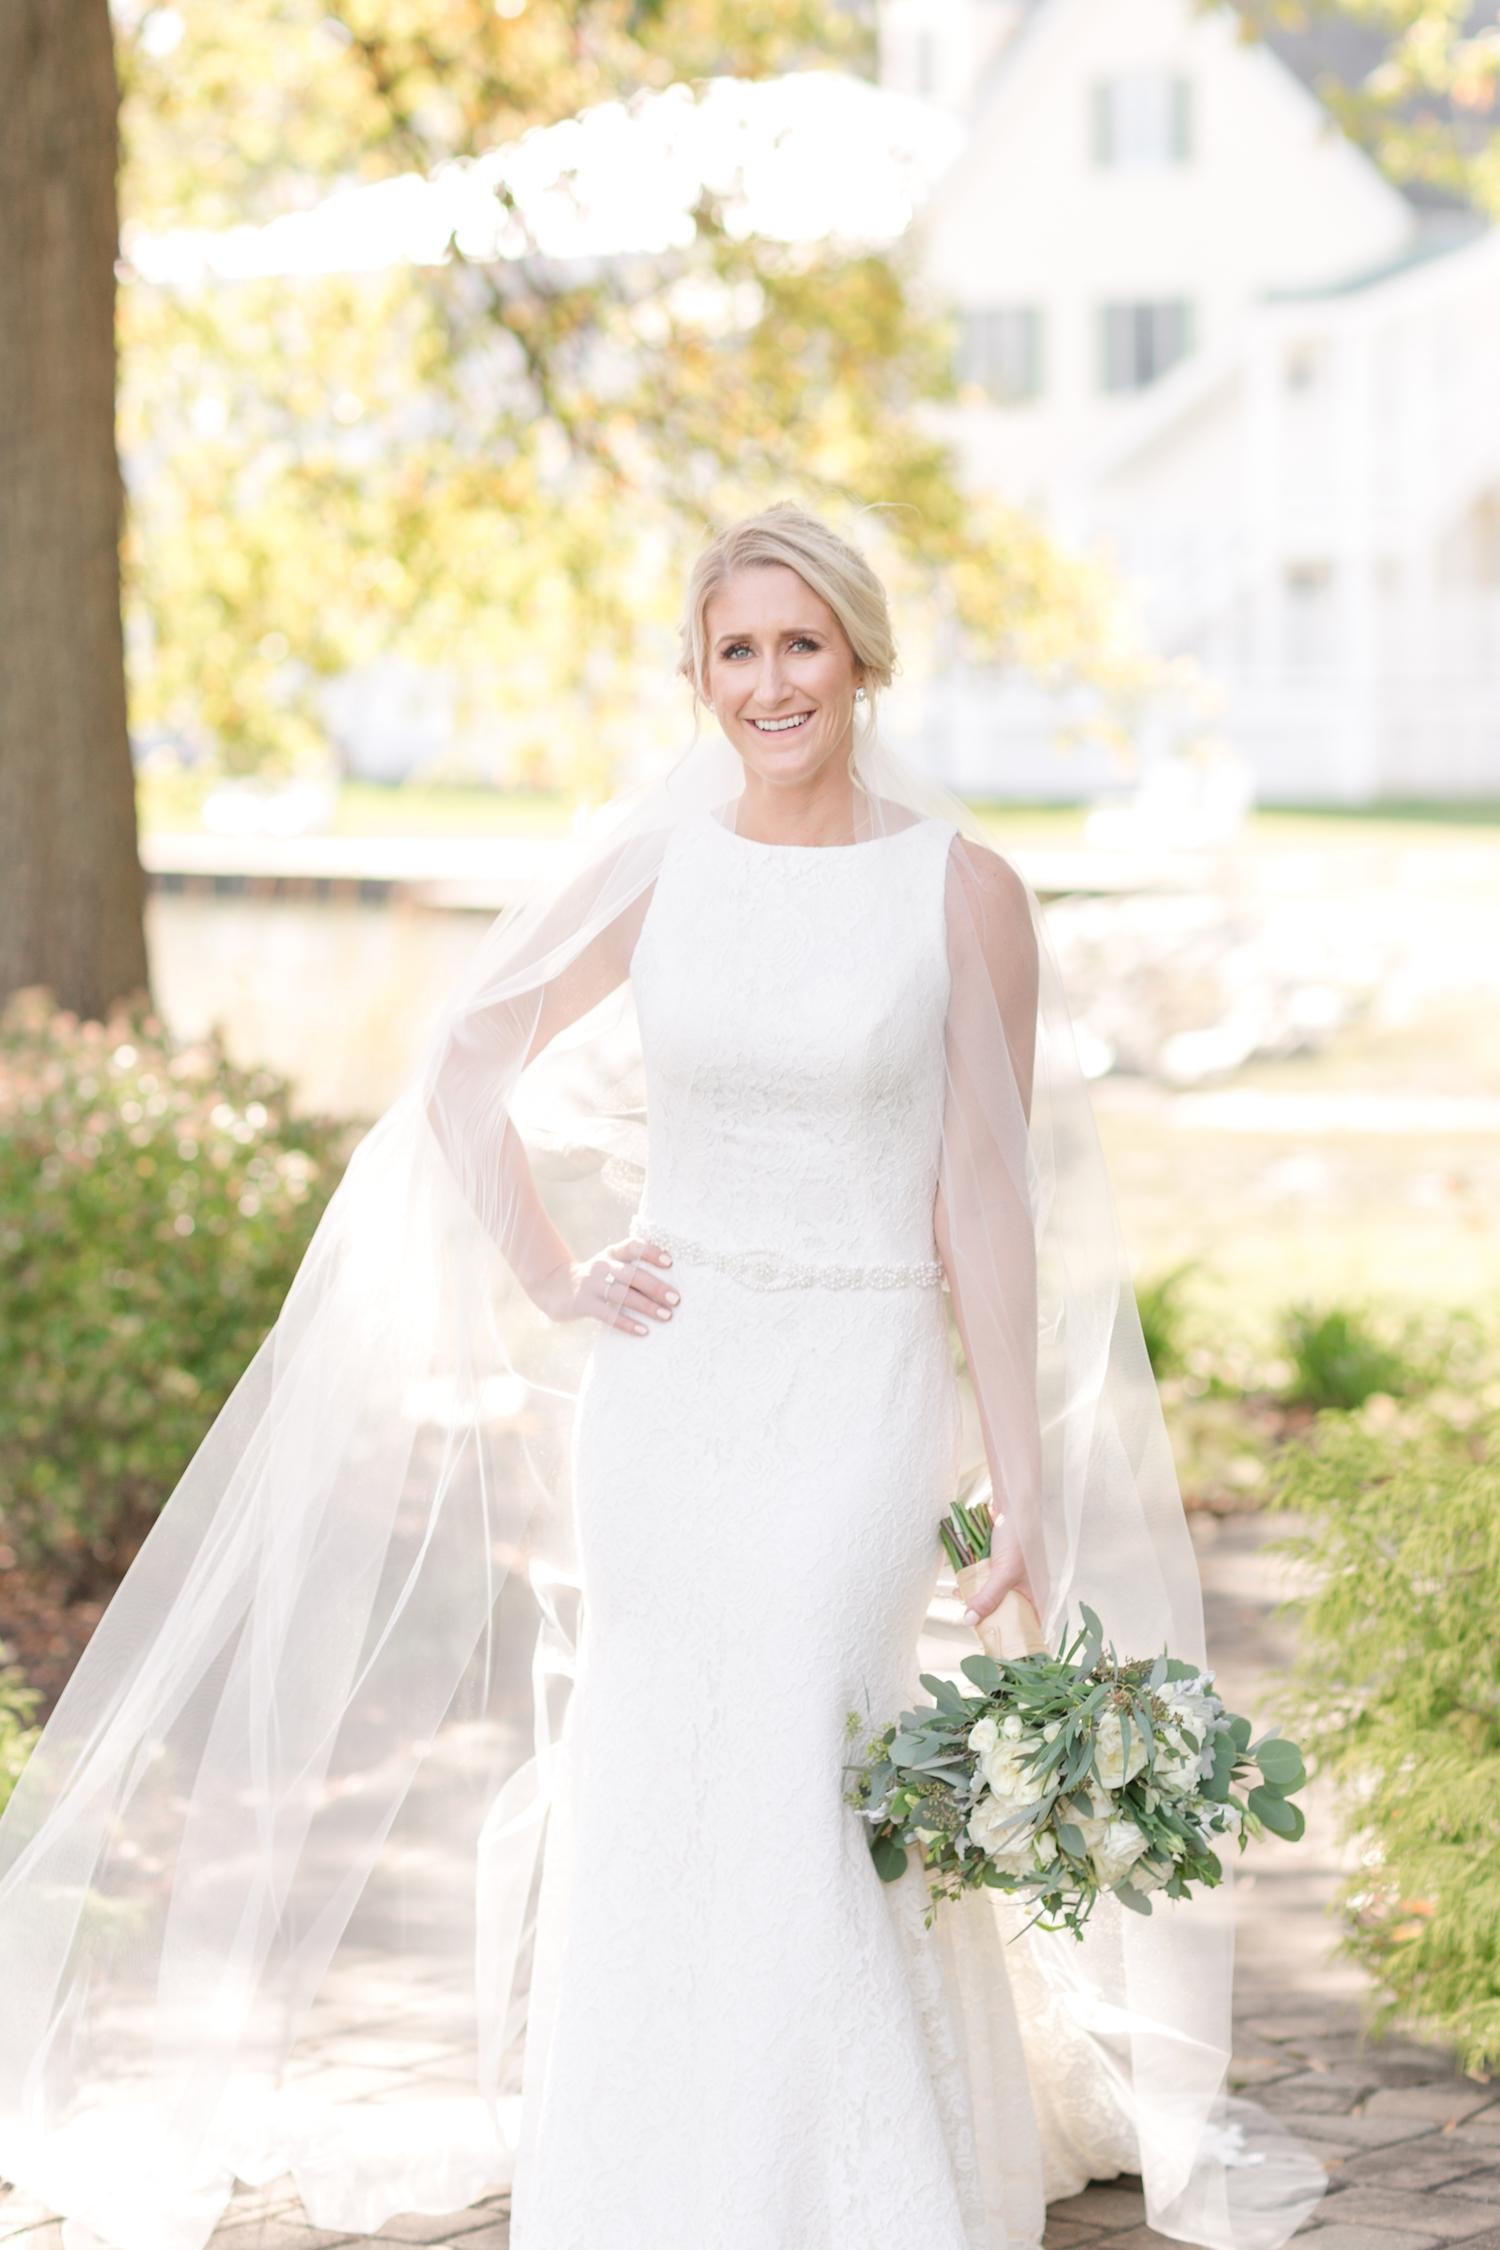 Wojciechowski Wedding-186_the-oaks-waterfront-inn-wedding-easton-maryland-wedding-photography-anna-grace-photography-photo.jpg